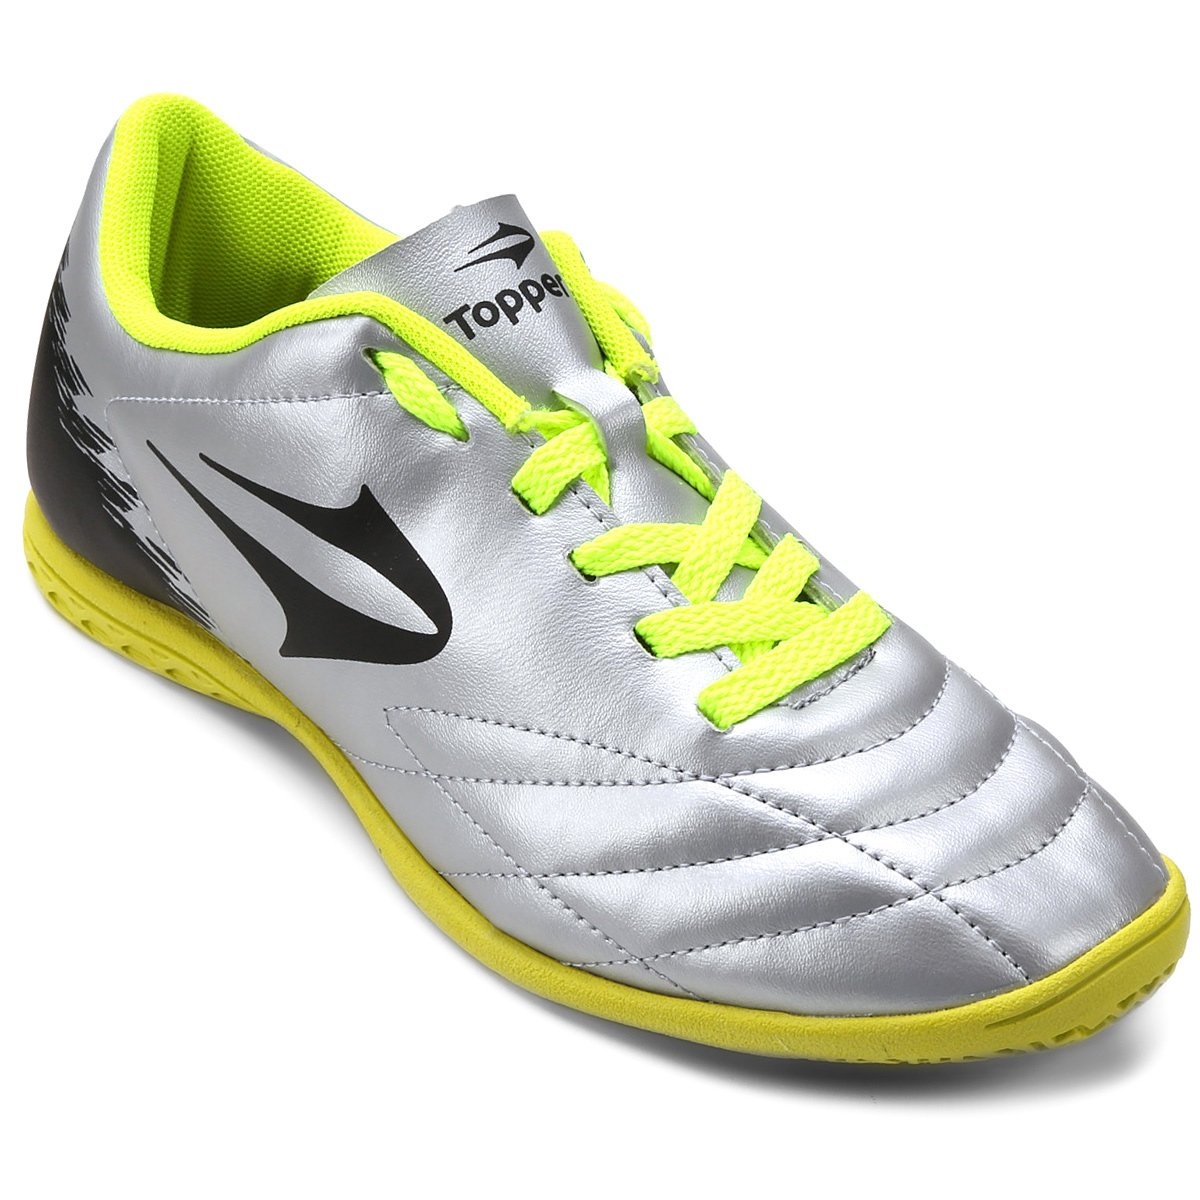 2d1b5d5e053c0 Chuteira Futsal Topper Slick 2 Masculina - Compre Agora